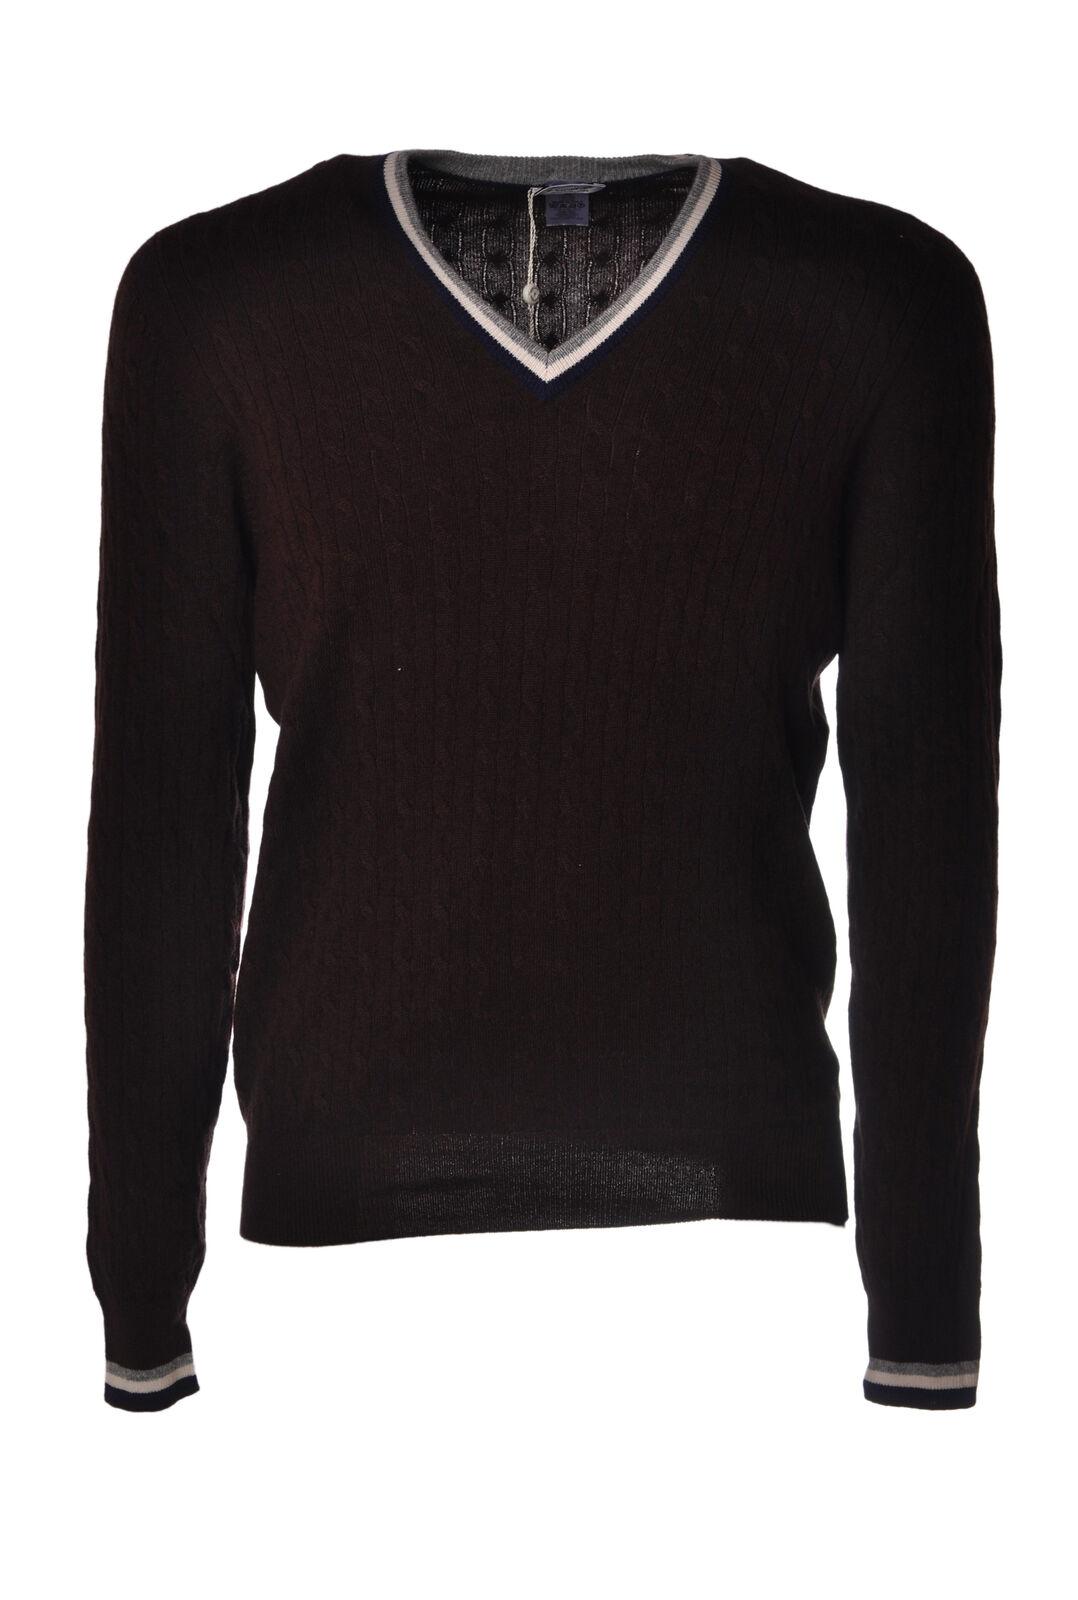 Viadeste  -  Sweaters - Male - Braun - 4682021A185320